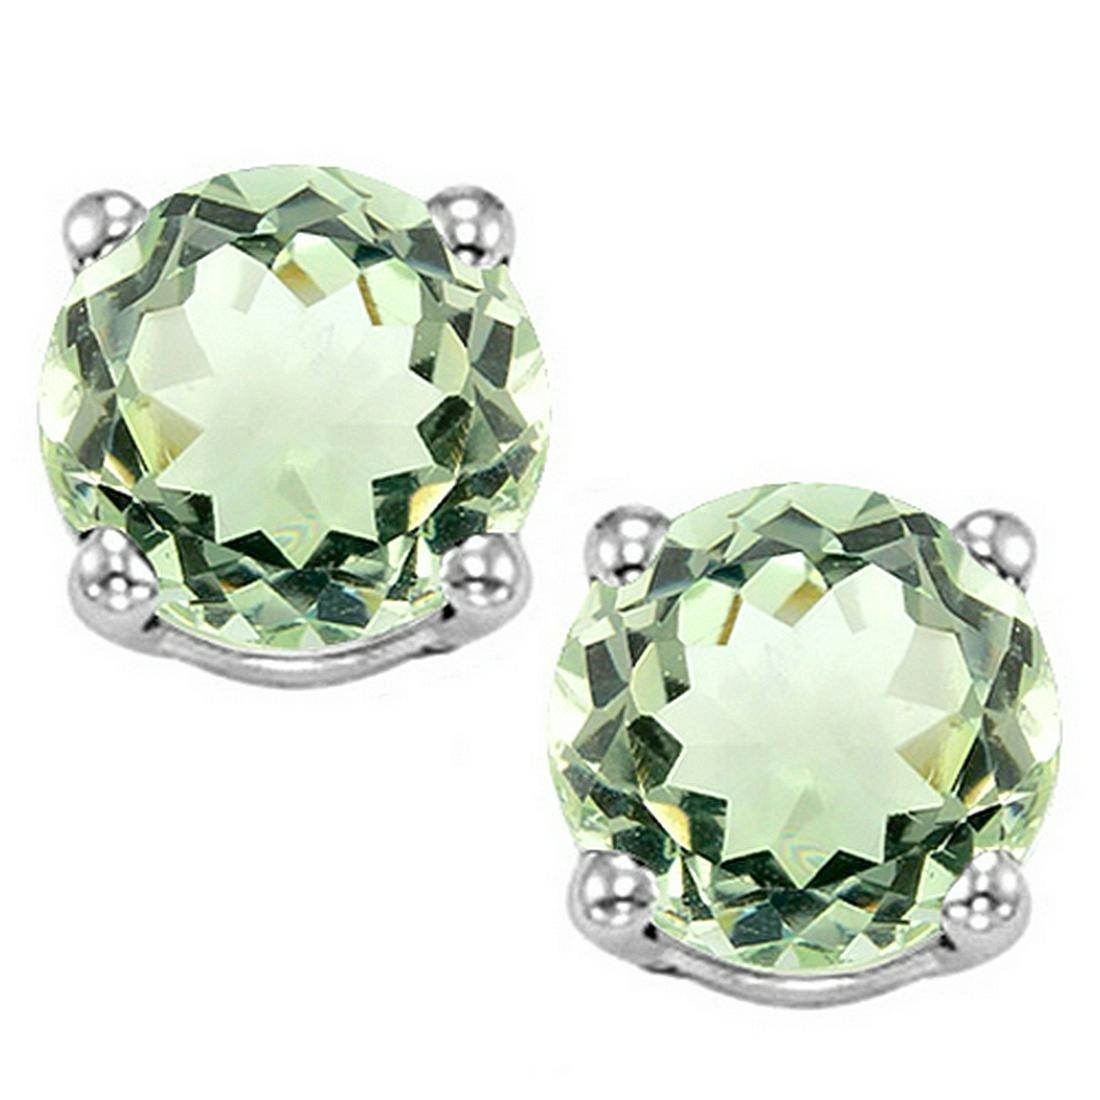 8MM Large Green Amethyst Stud Earrings in Sterling